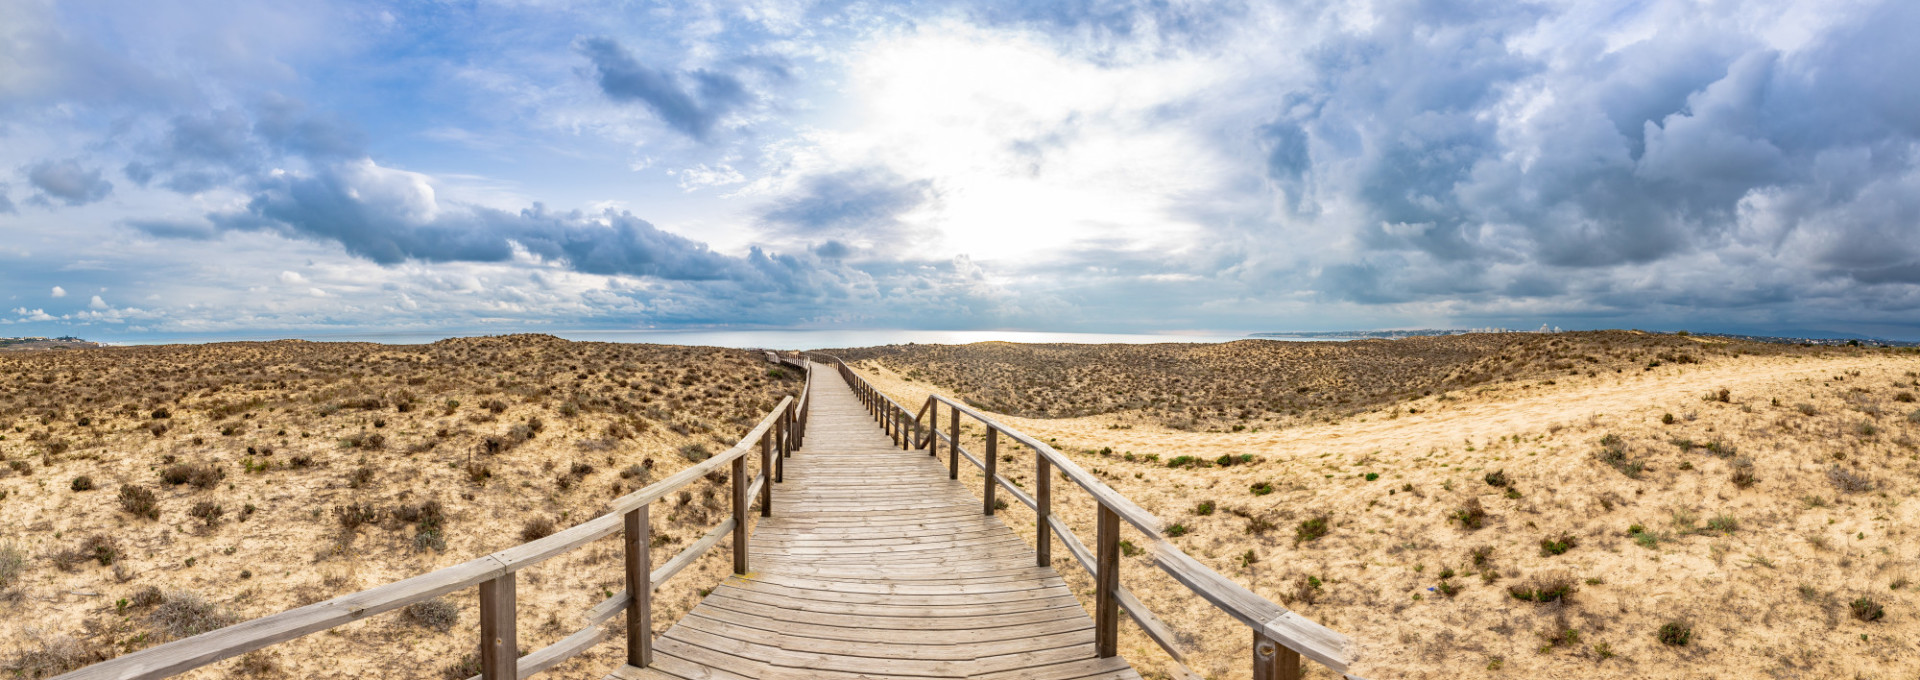 Beach Panorama in Portugal